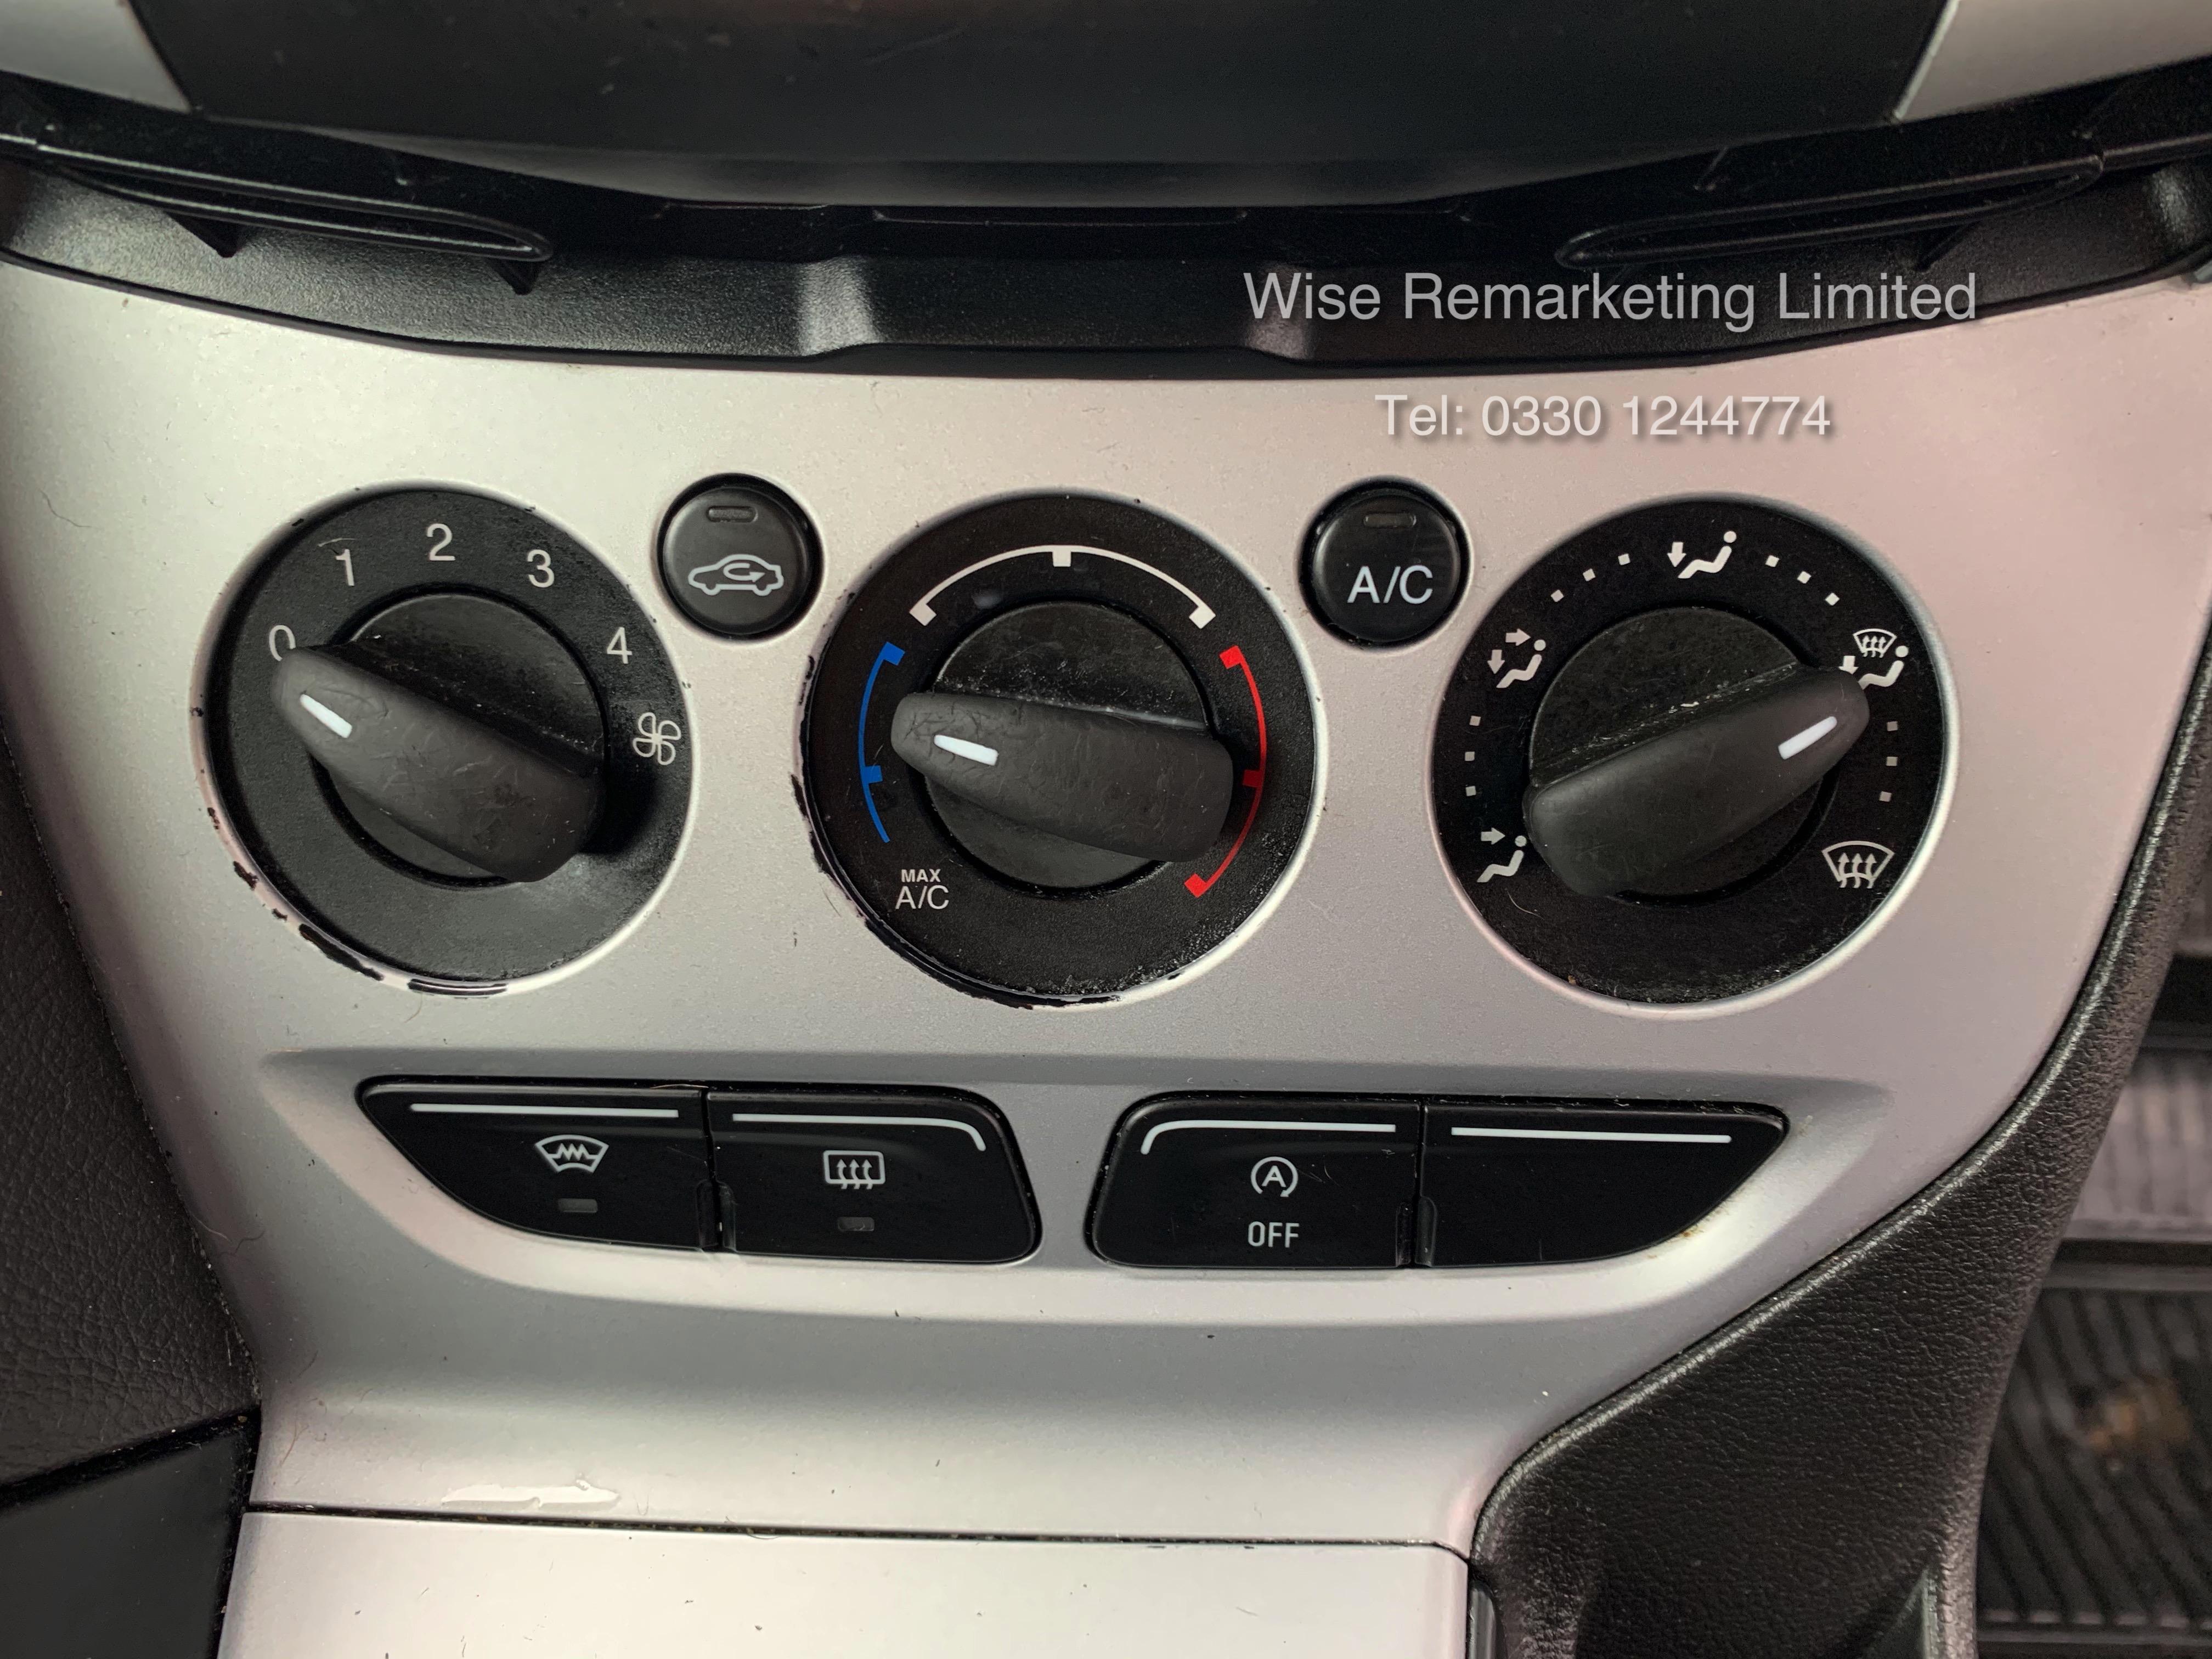 Ford Focus Zetec 1.6 TDCI Econetic - 2015 Model - 6 Speed - - Image 17 of 20